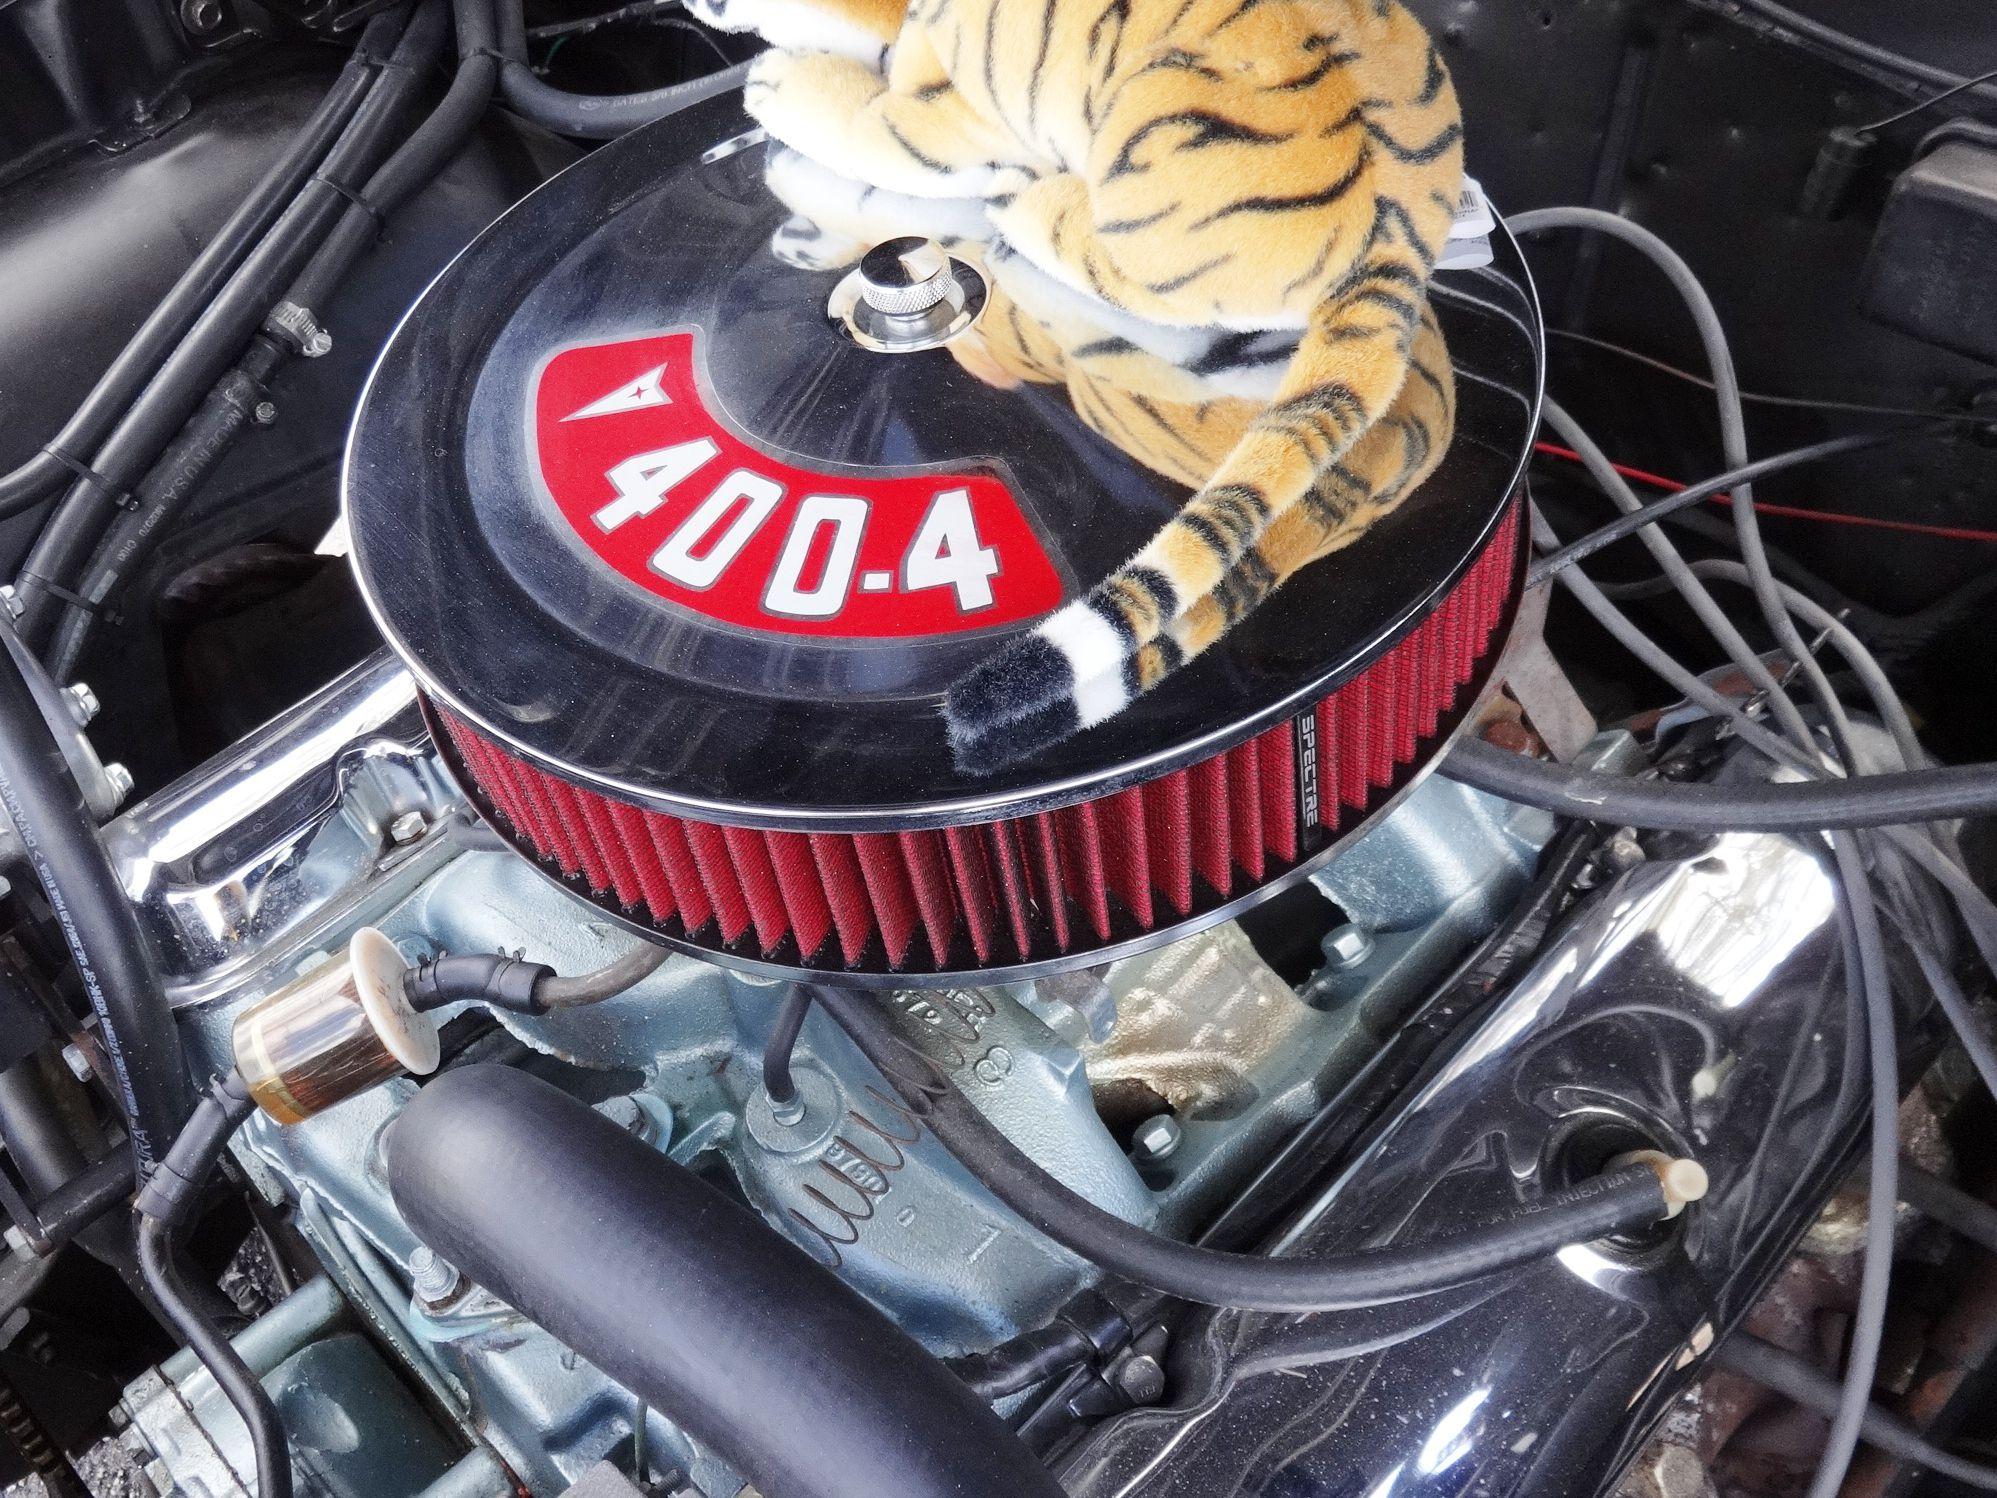 The Legendary Pontiac Ram Air 400-Cubic-Inch Engines